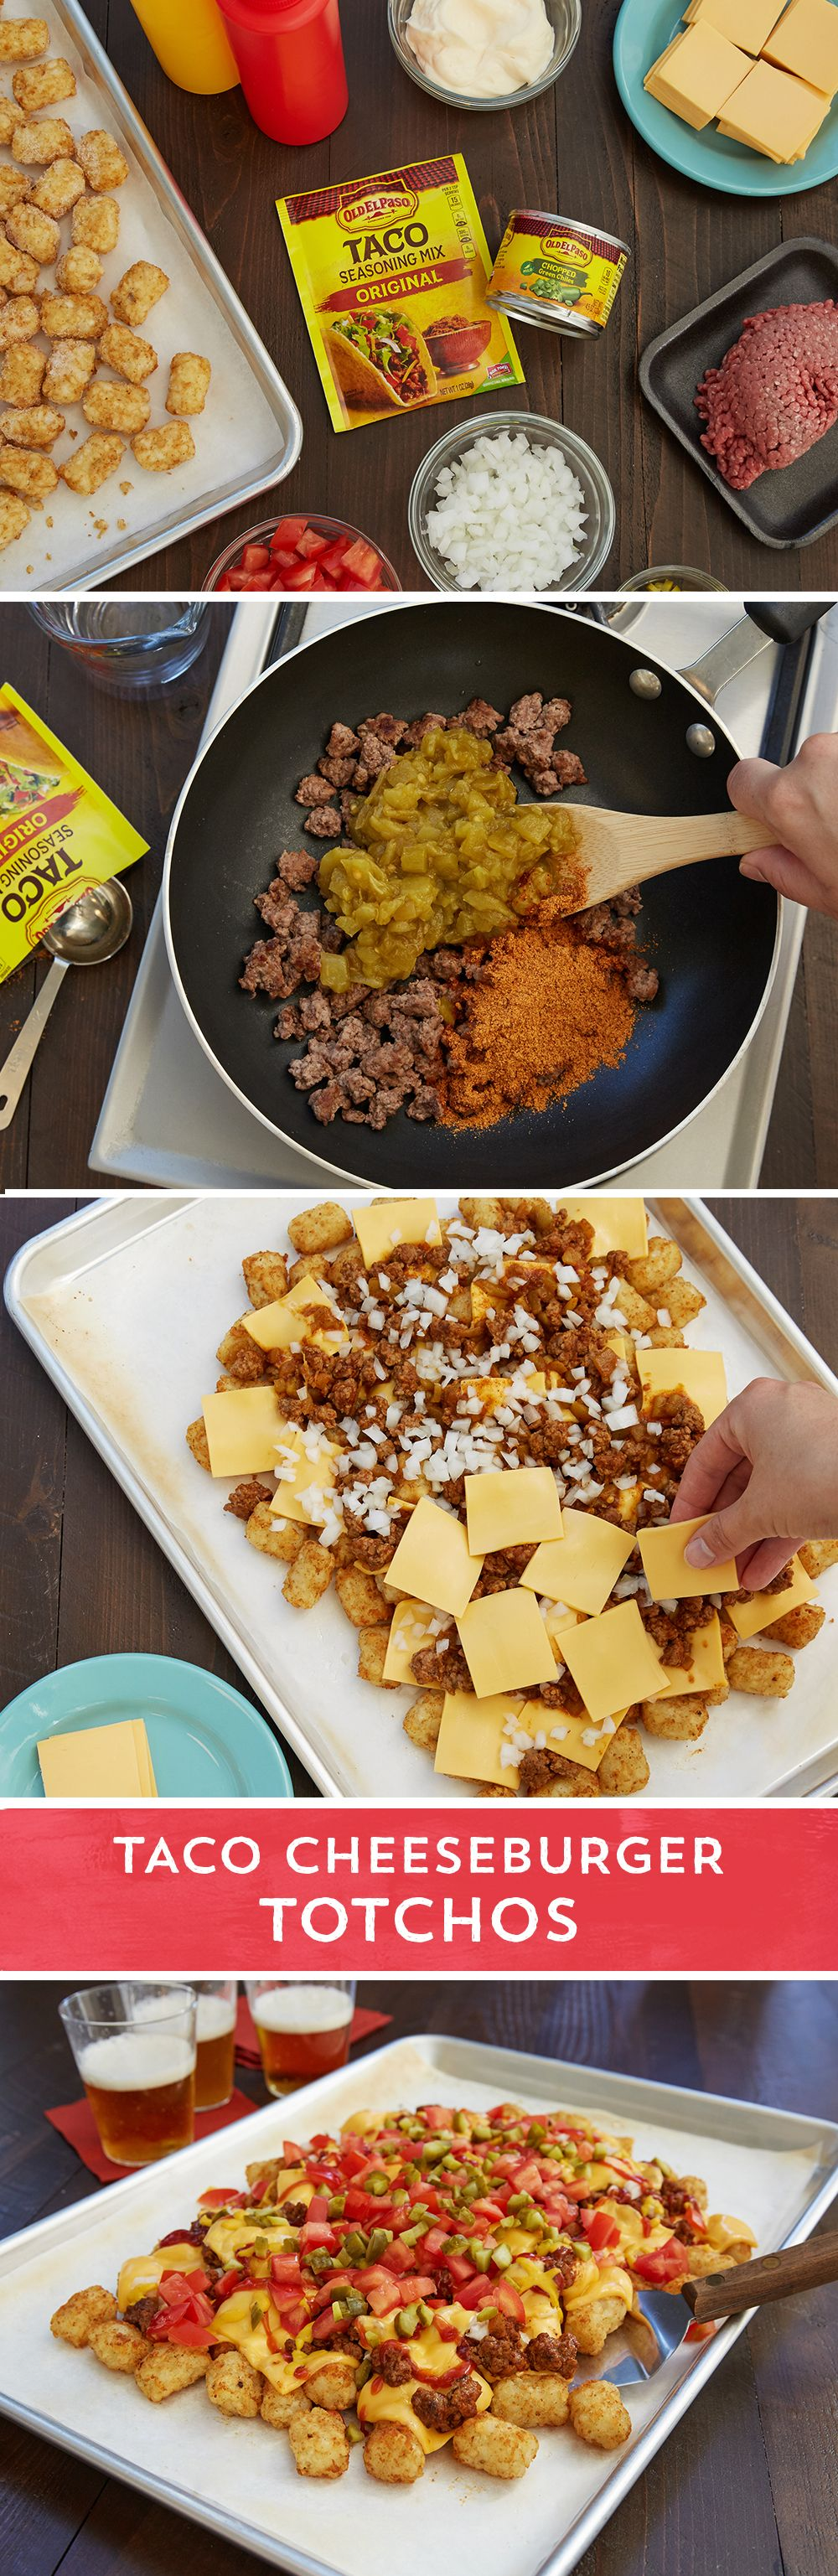 Taco Cheeseburger Totchos Recipe Dinners Pinterest Hamburger